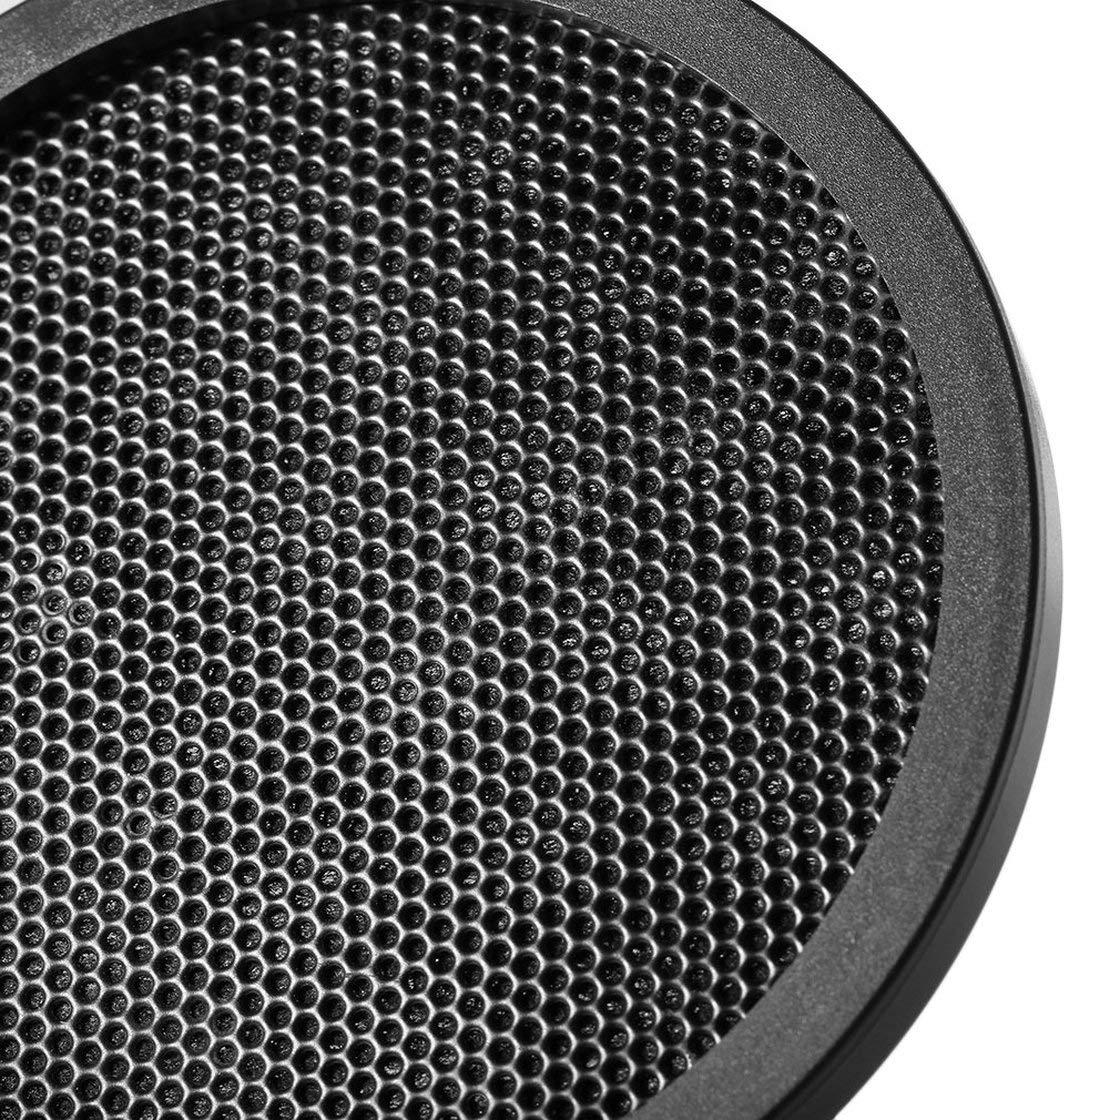 Color: Negro Laurelmartina PS-2 Double Layer Studio Micr/ófono Micr/ófono Pantalla Pop Filtro para grabaci/ón